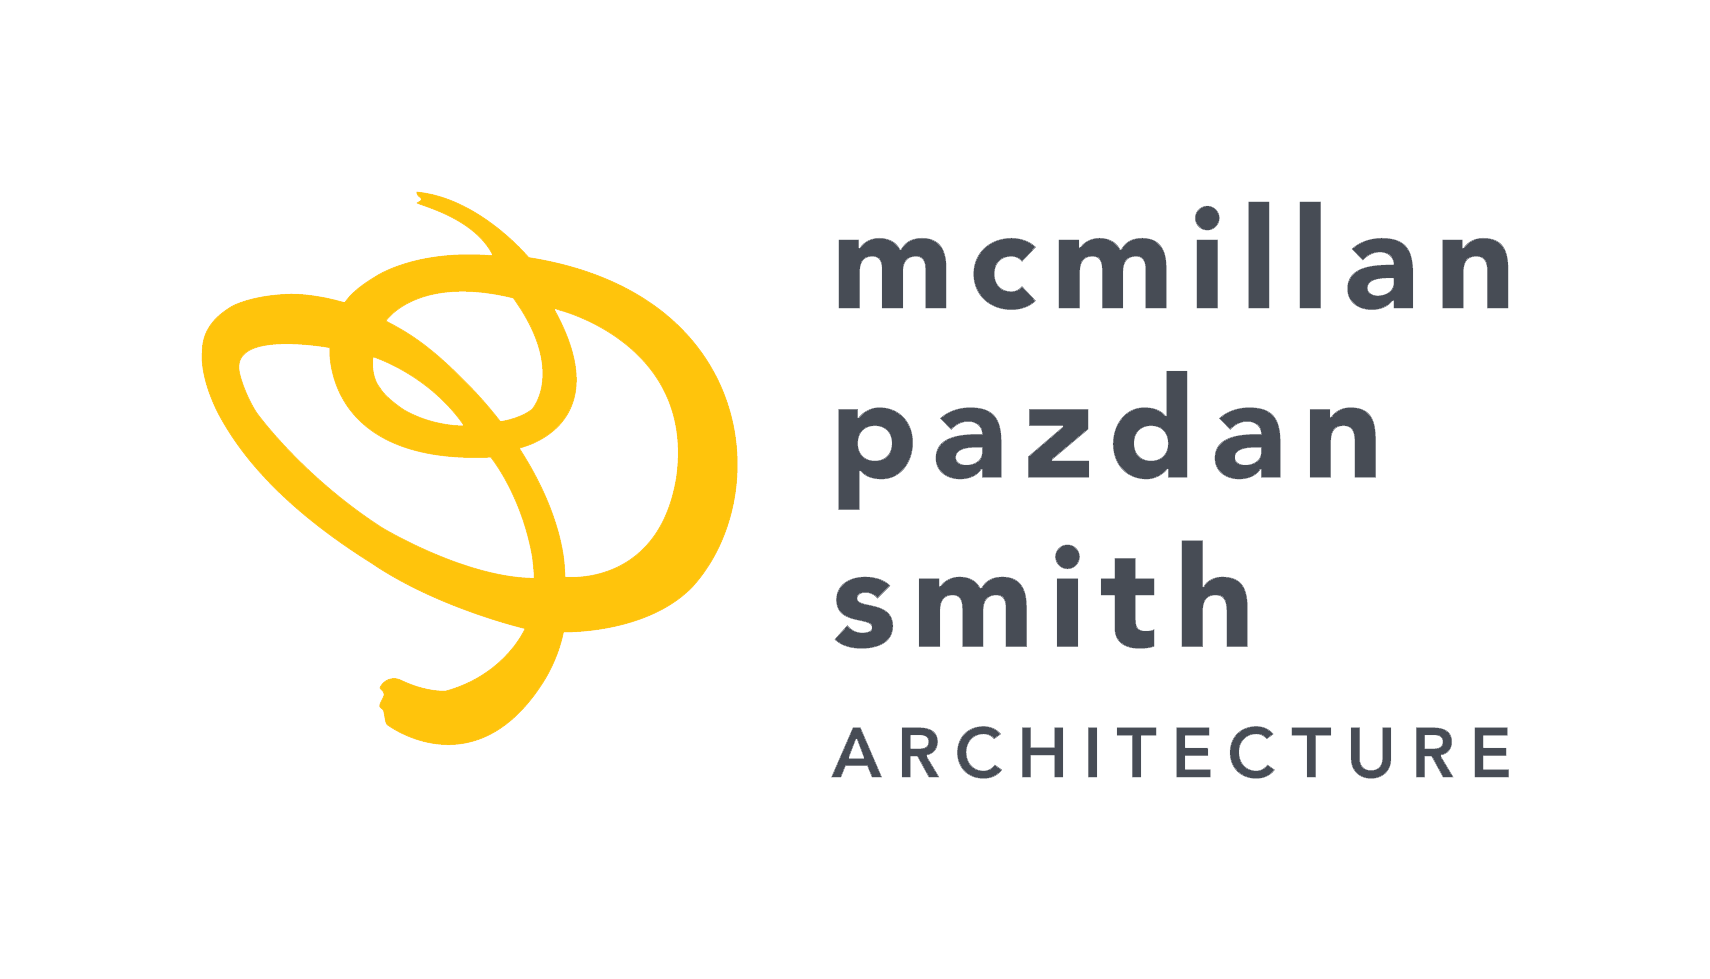 McMillan Pazdan Smith Architecture